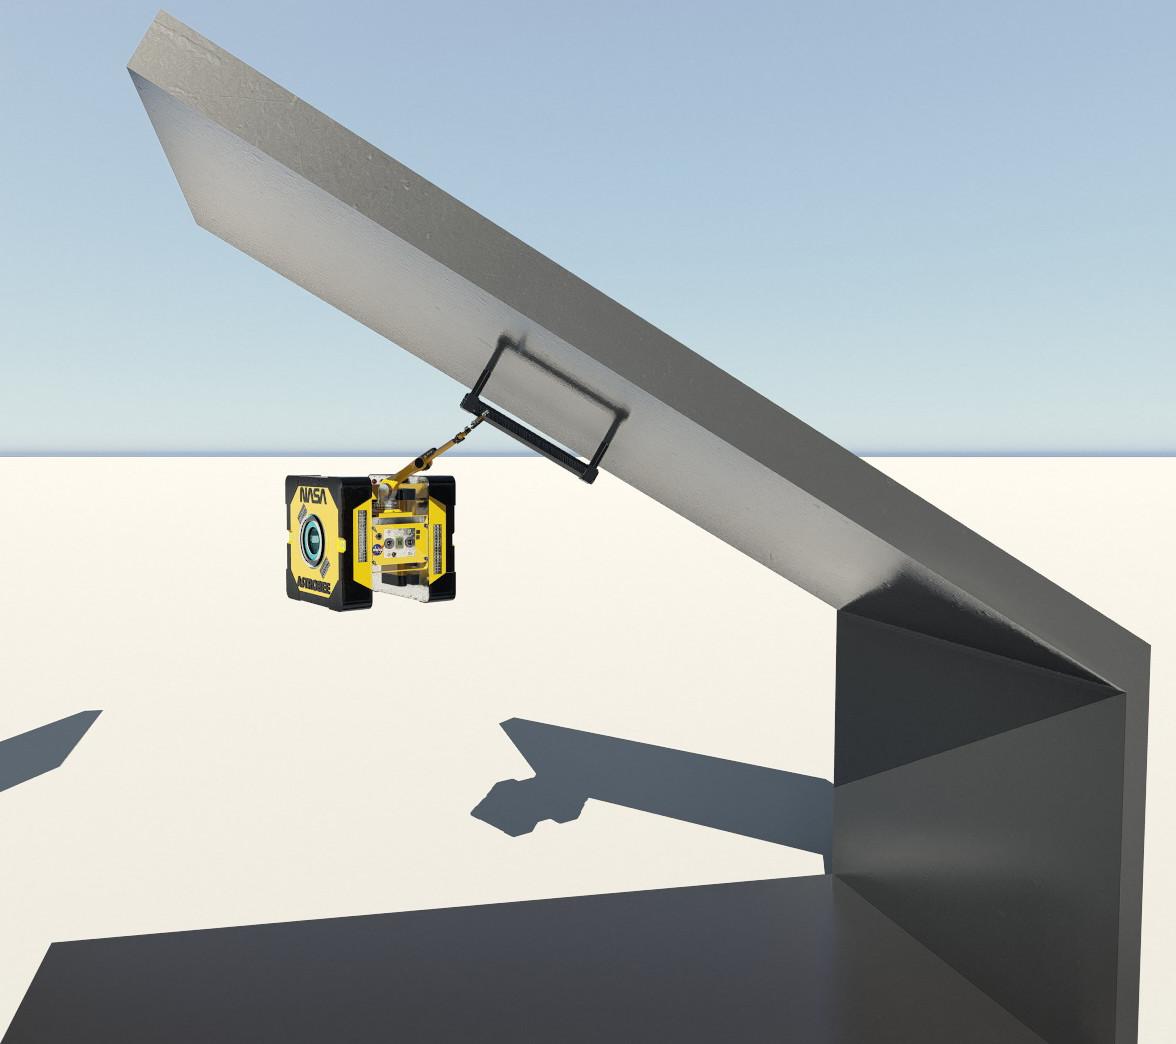 ASTROBEE SRA in ISS Pixani & NASA  #pixani #NASA #Astrobee #robot